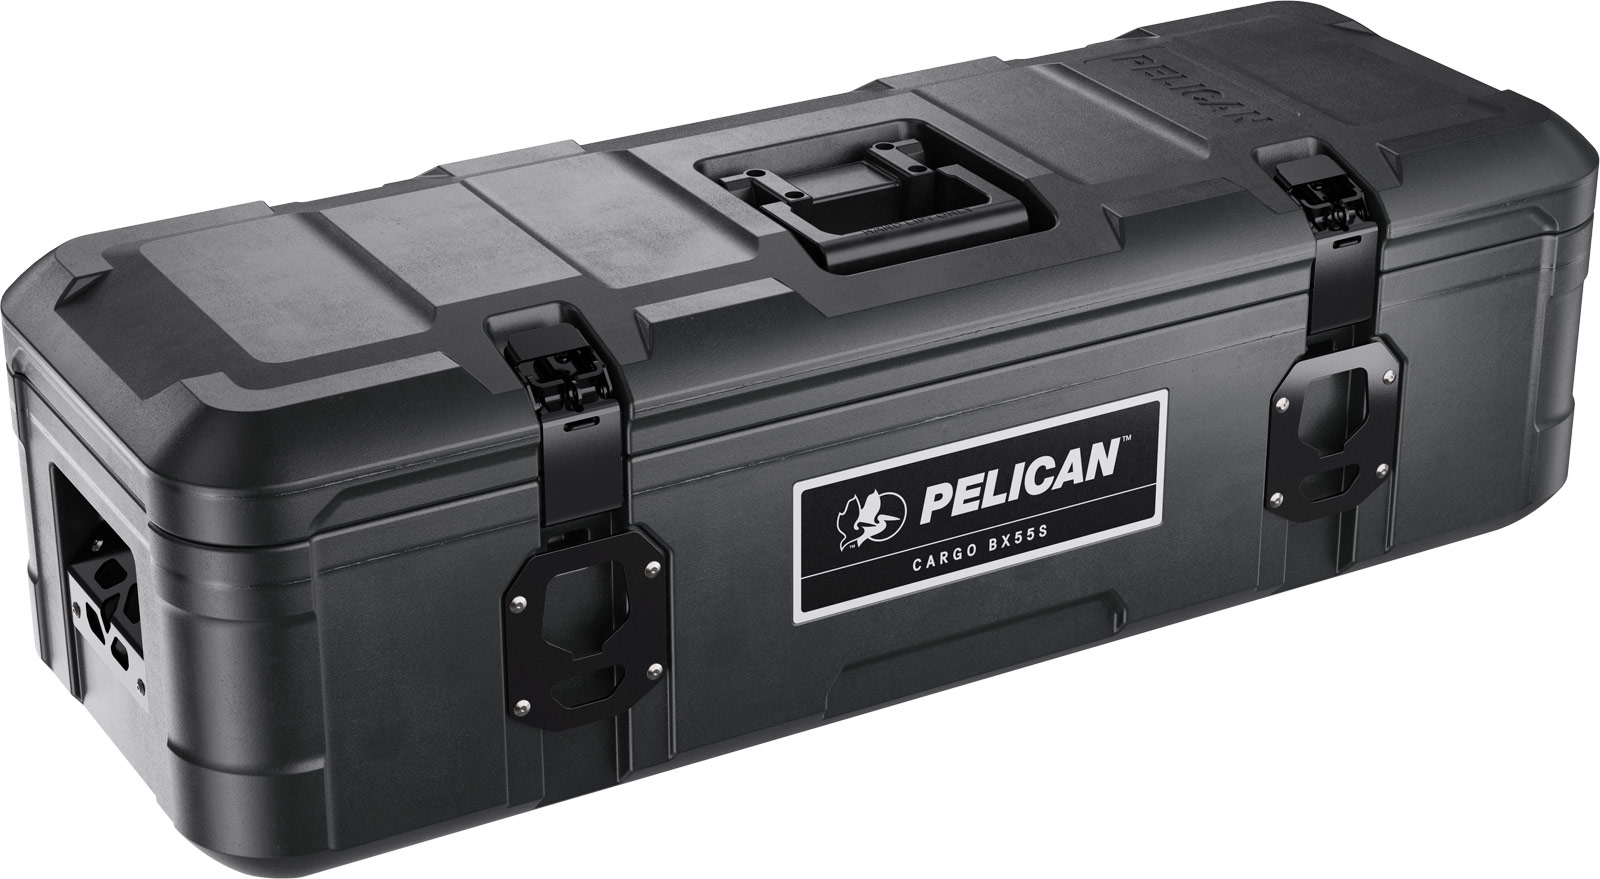 pelican cargo bx55s saddle case